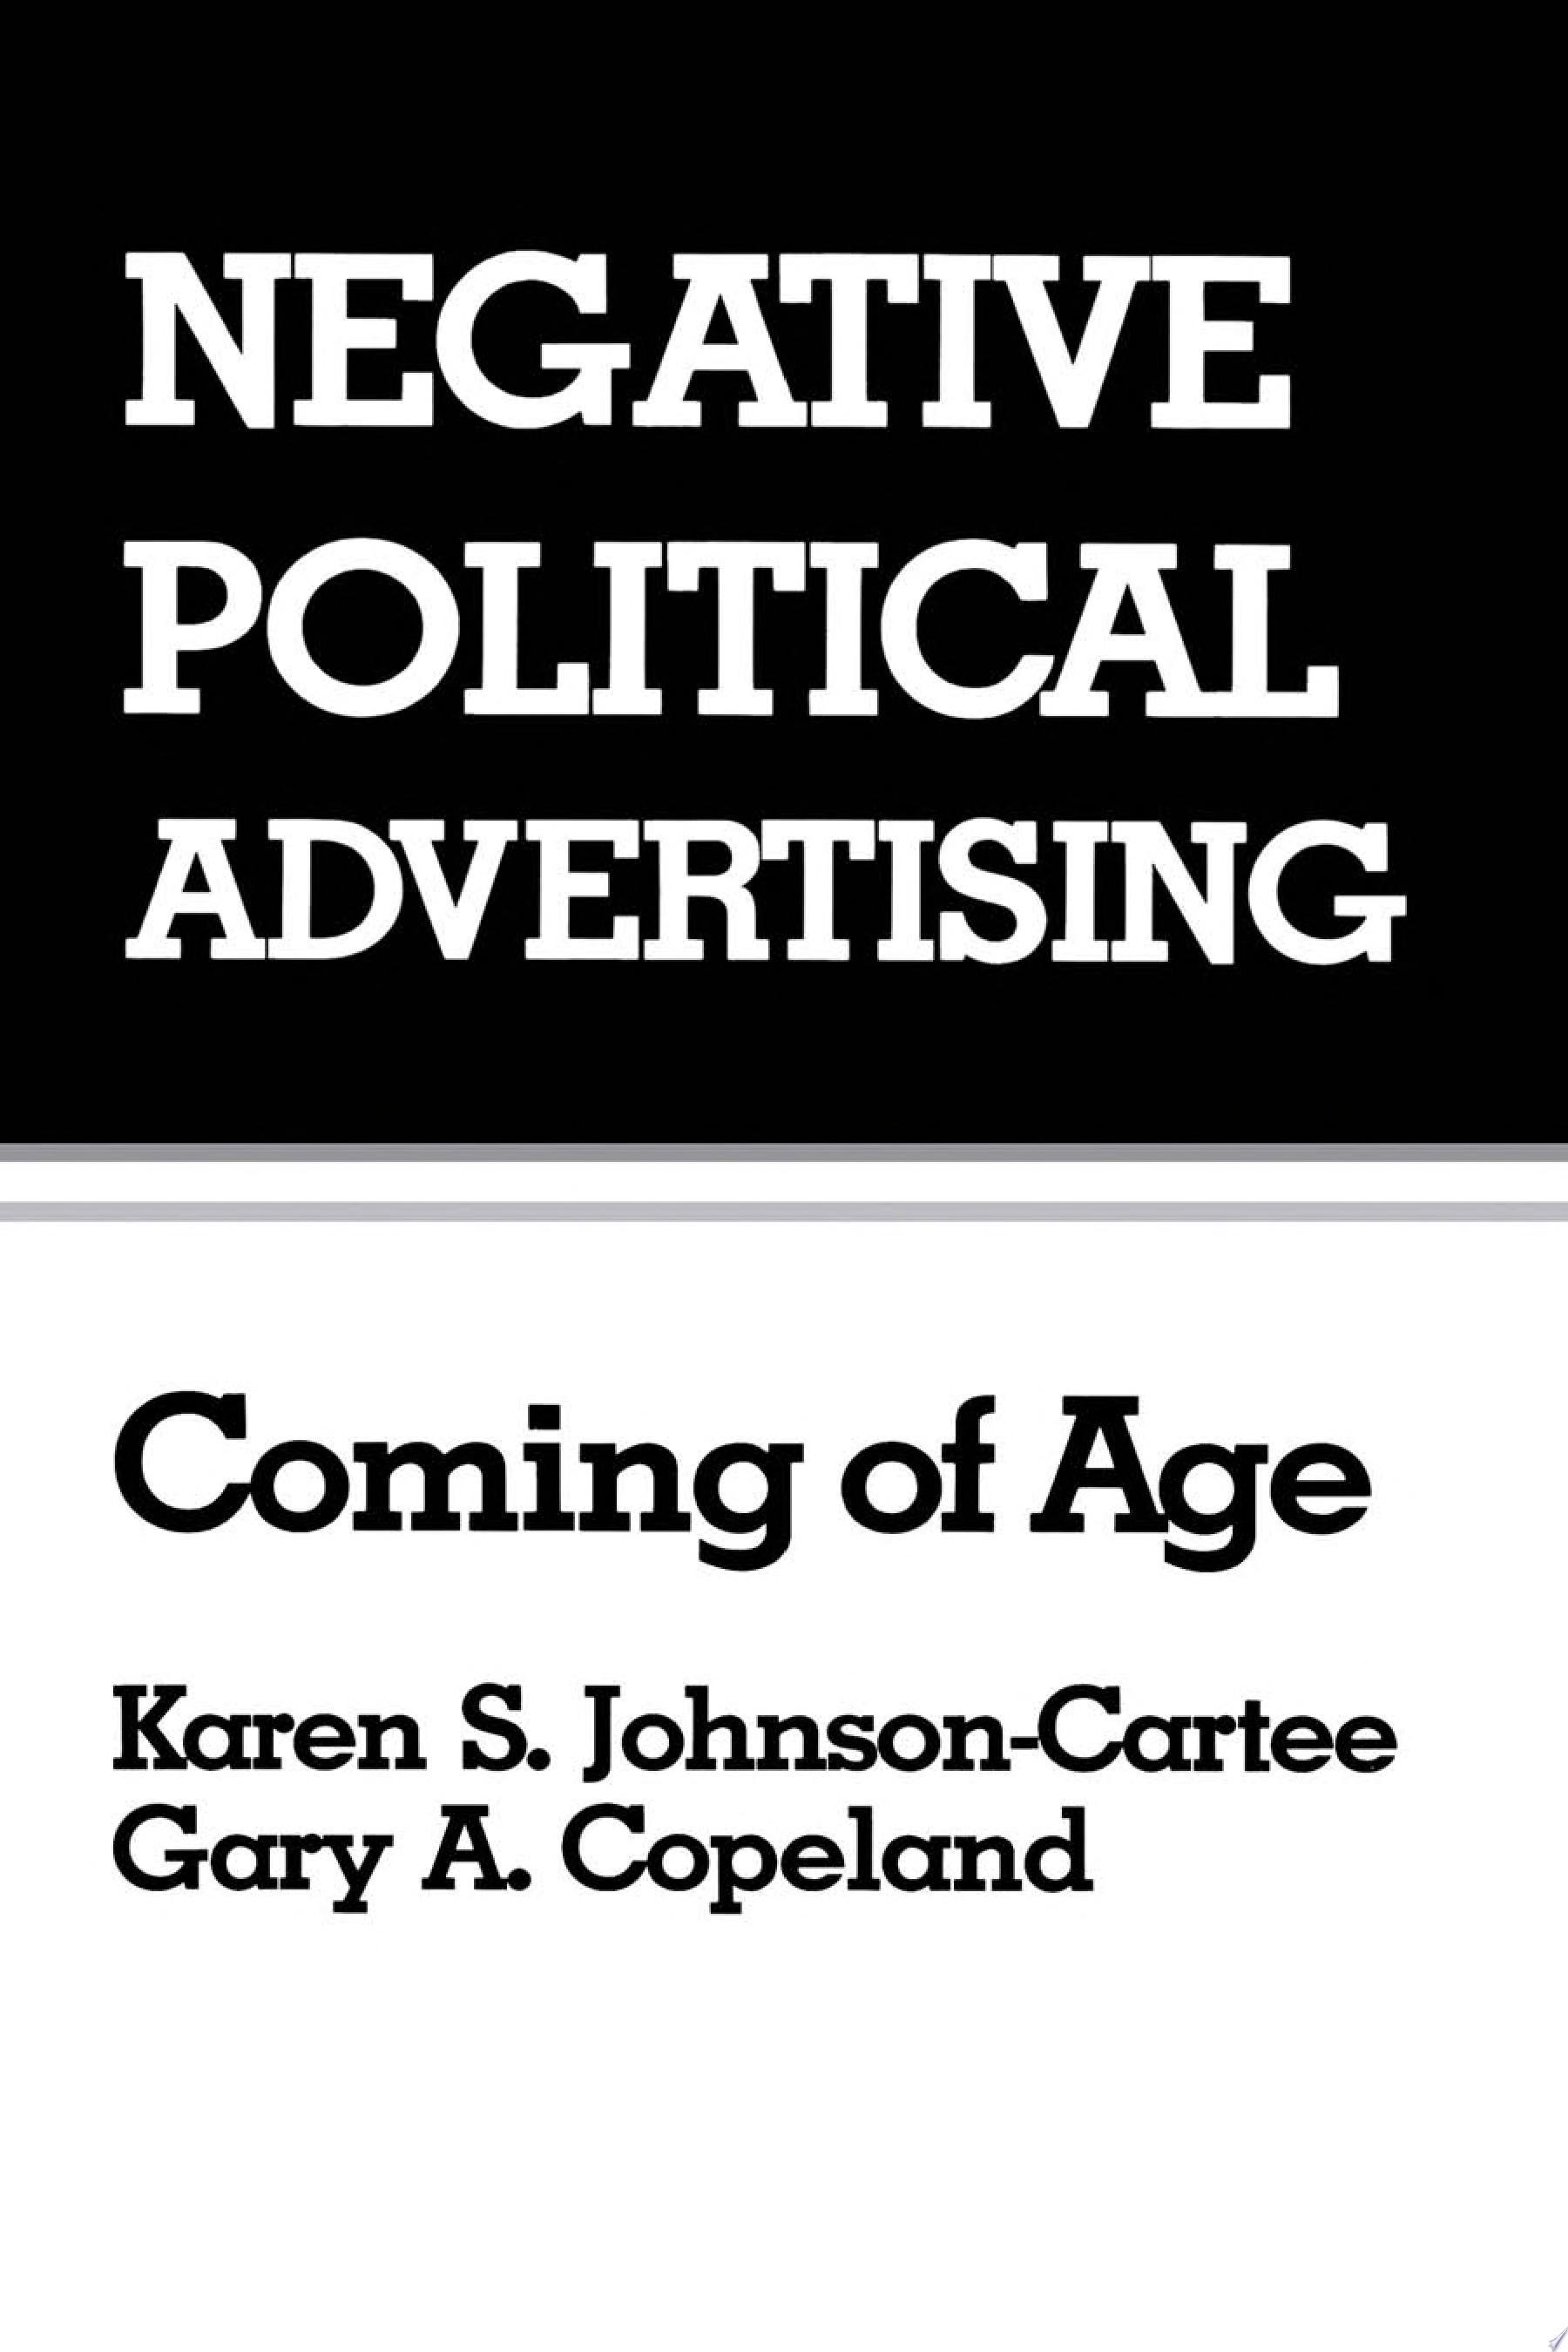 Negative Political Advertising